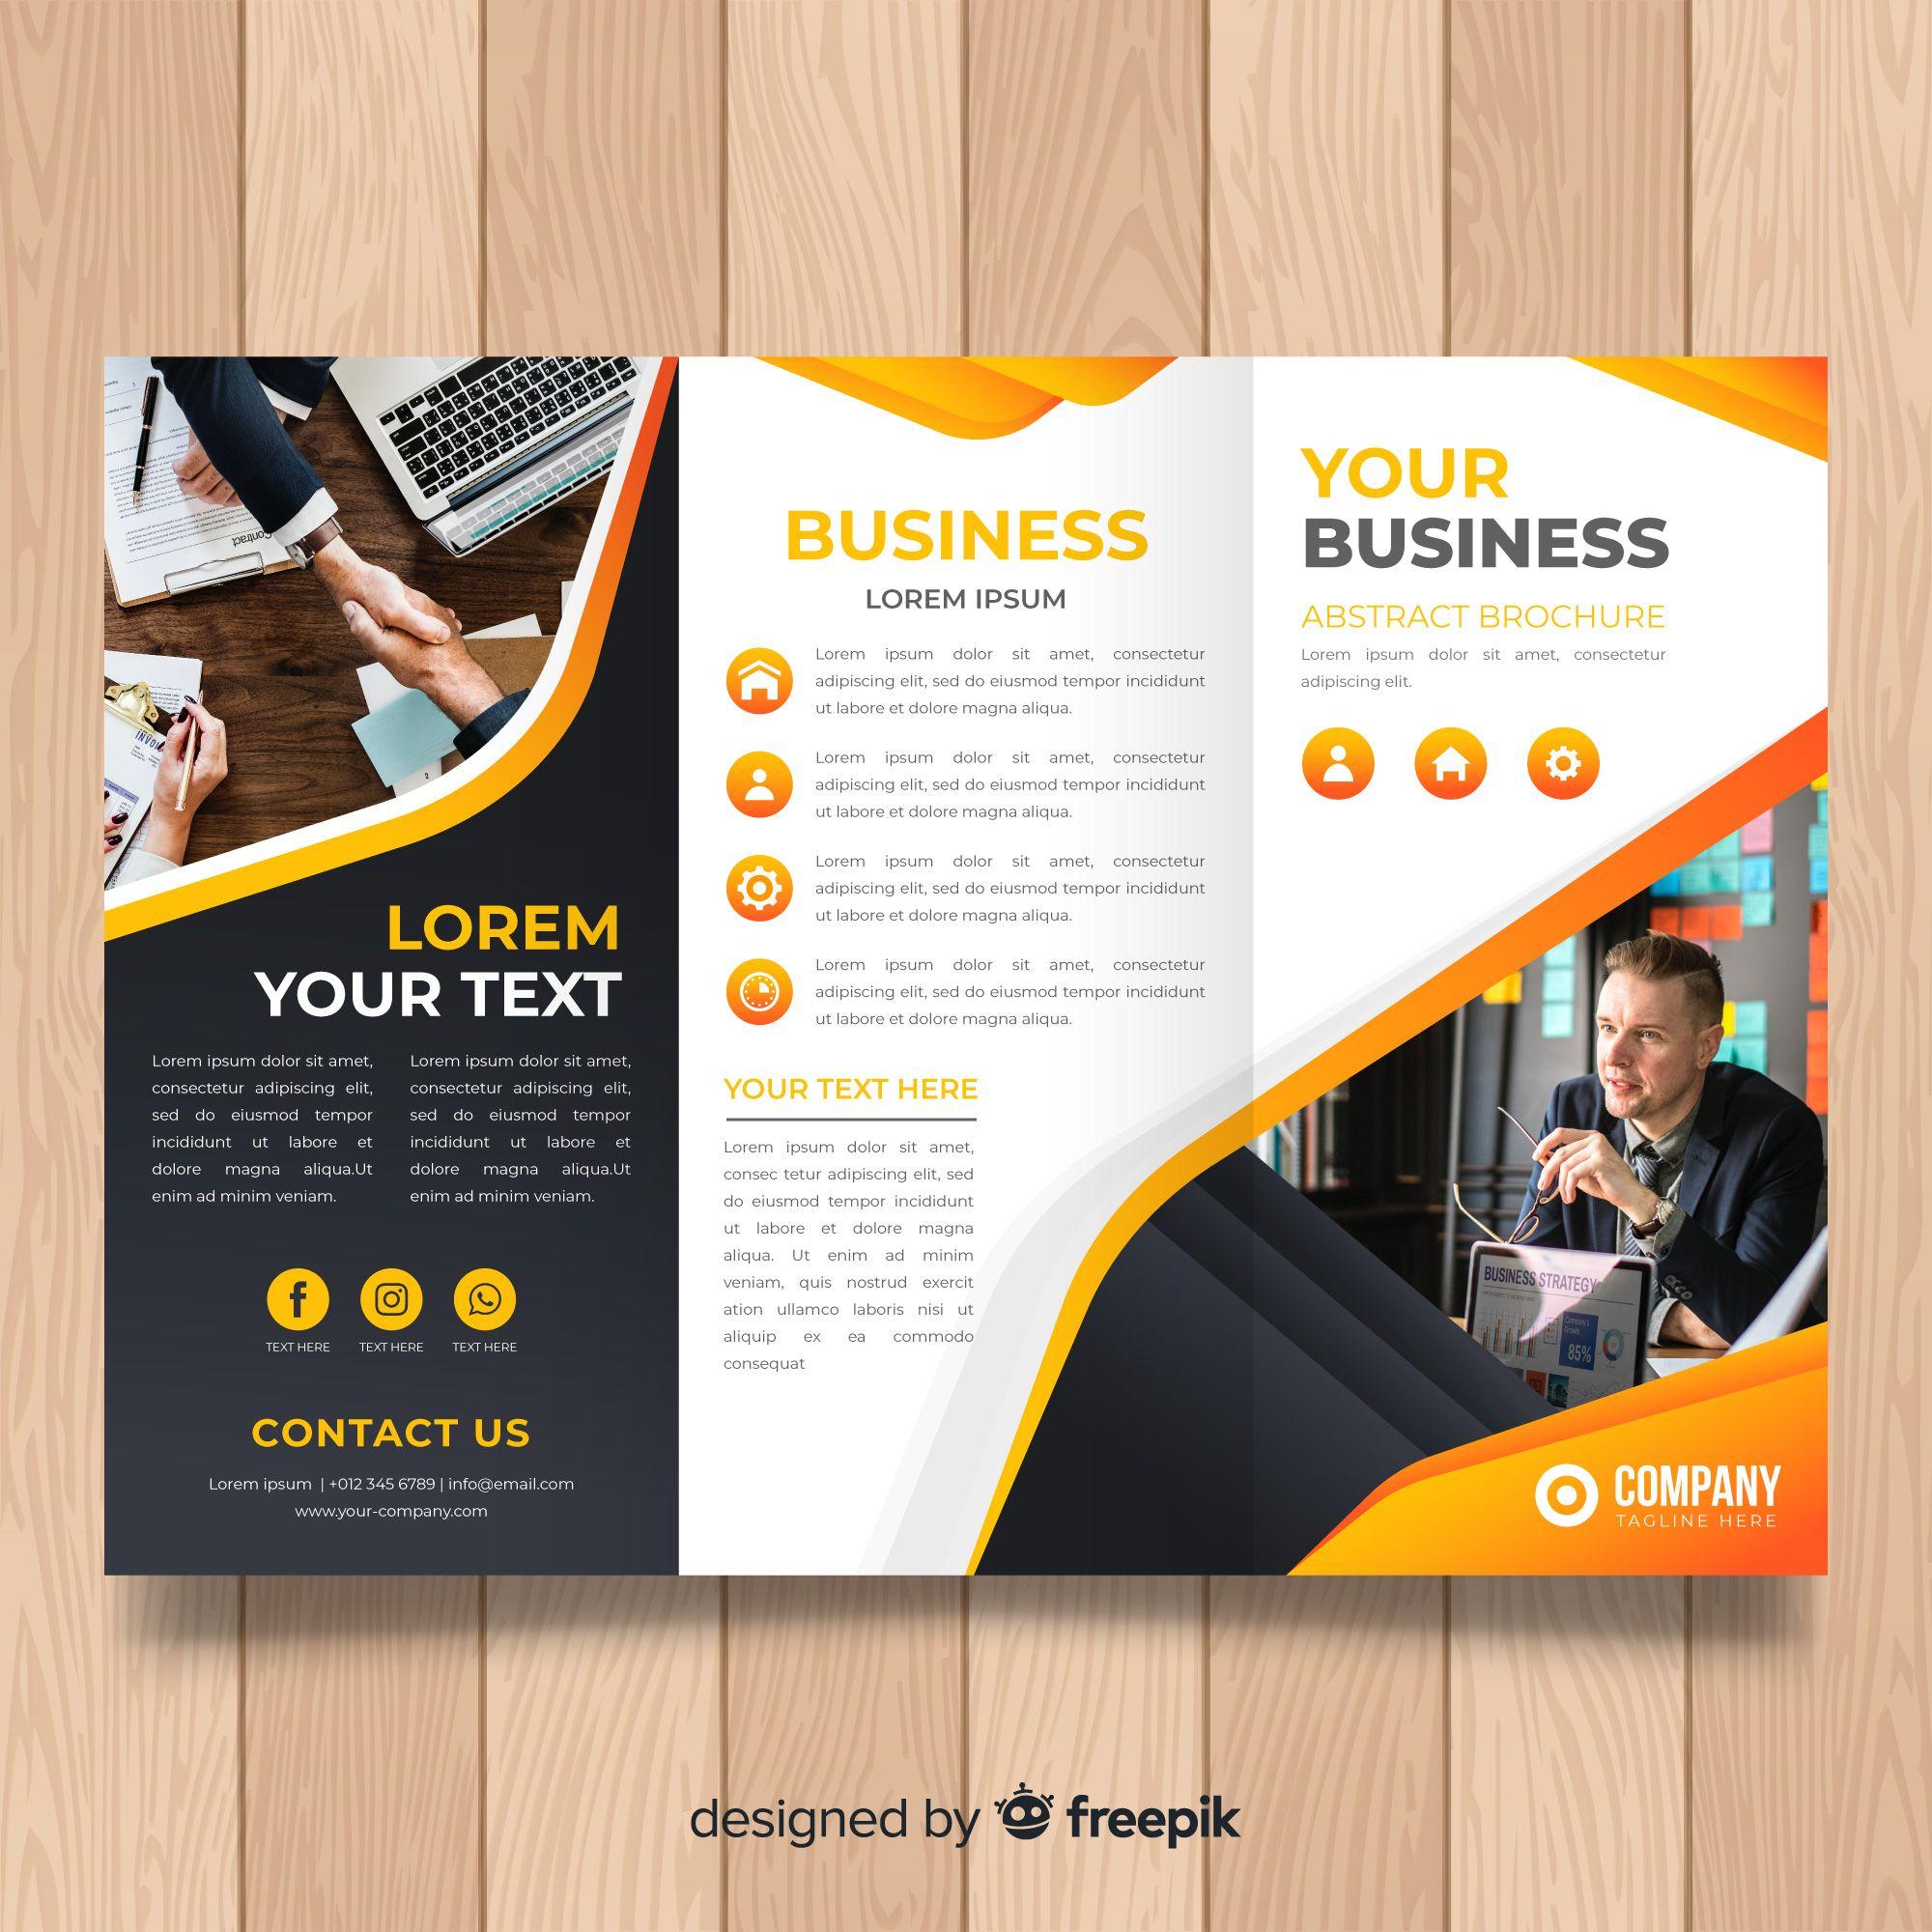 Business Trifold Brochure Brochure Trifold Brochure Brochure Design Template